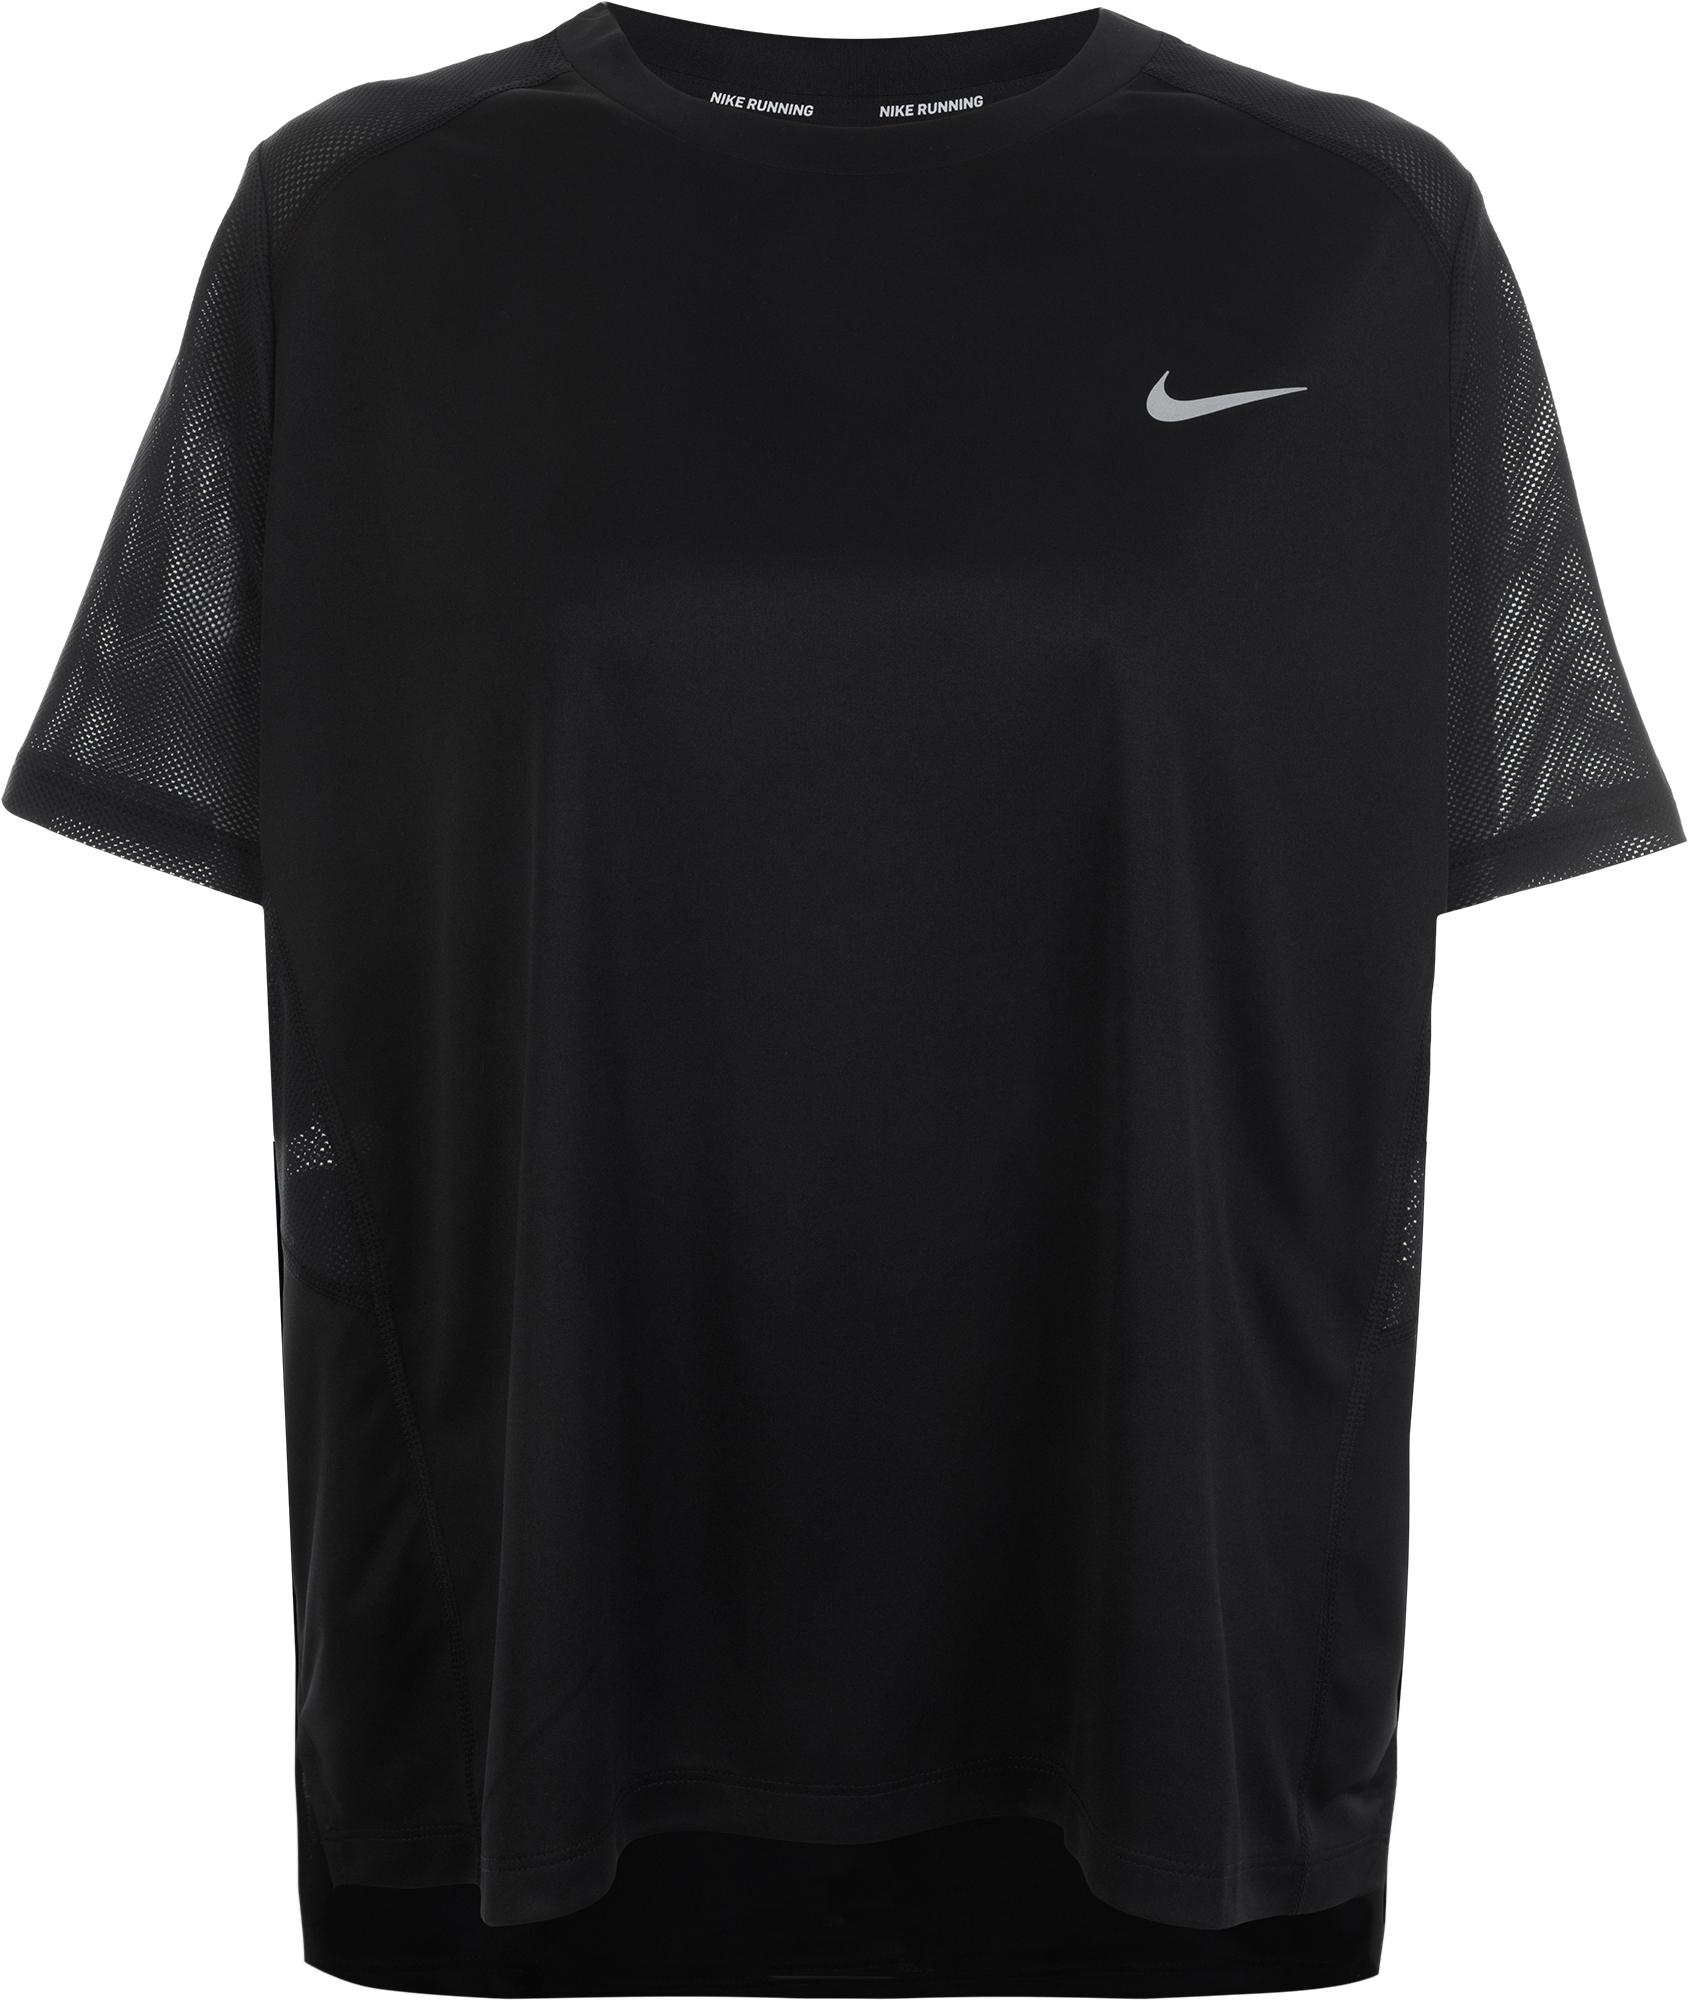 Nike Футболка женская Nike Miler, размер 54-56 футболка женская nike pro top цвет белый 889540 100 размер s 42 44